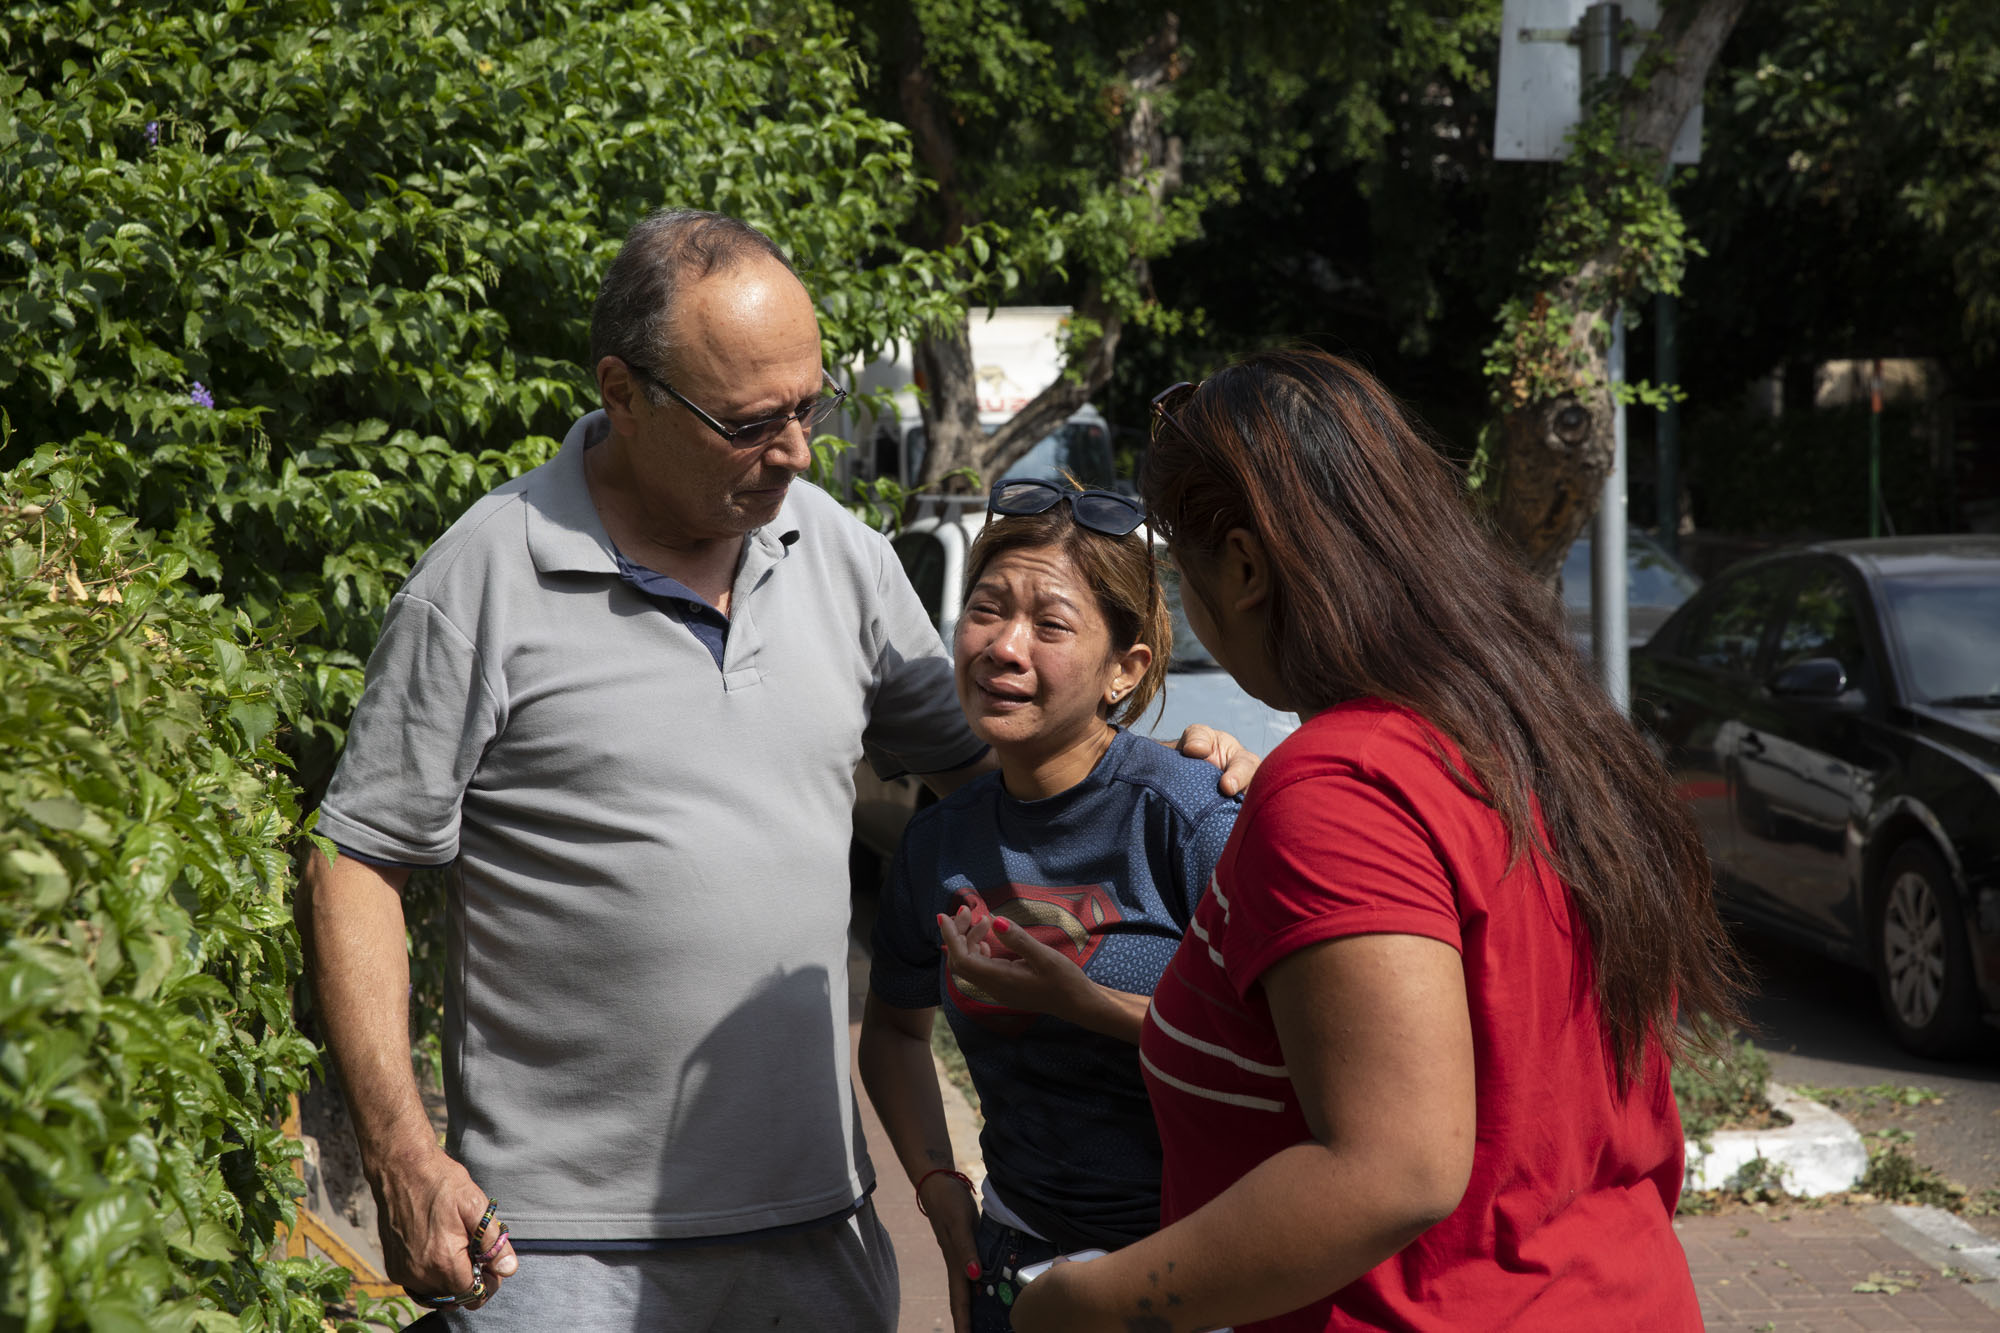 A friend of Geraldine Esta is seen after the latter and her daughters were taken into custody, July 23, 2019. (Oren Ziv/Activestills.org)